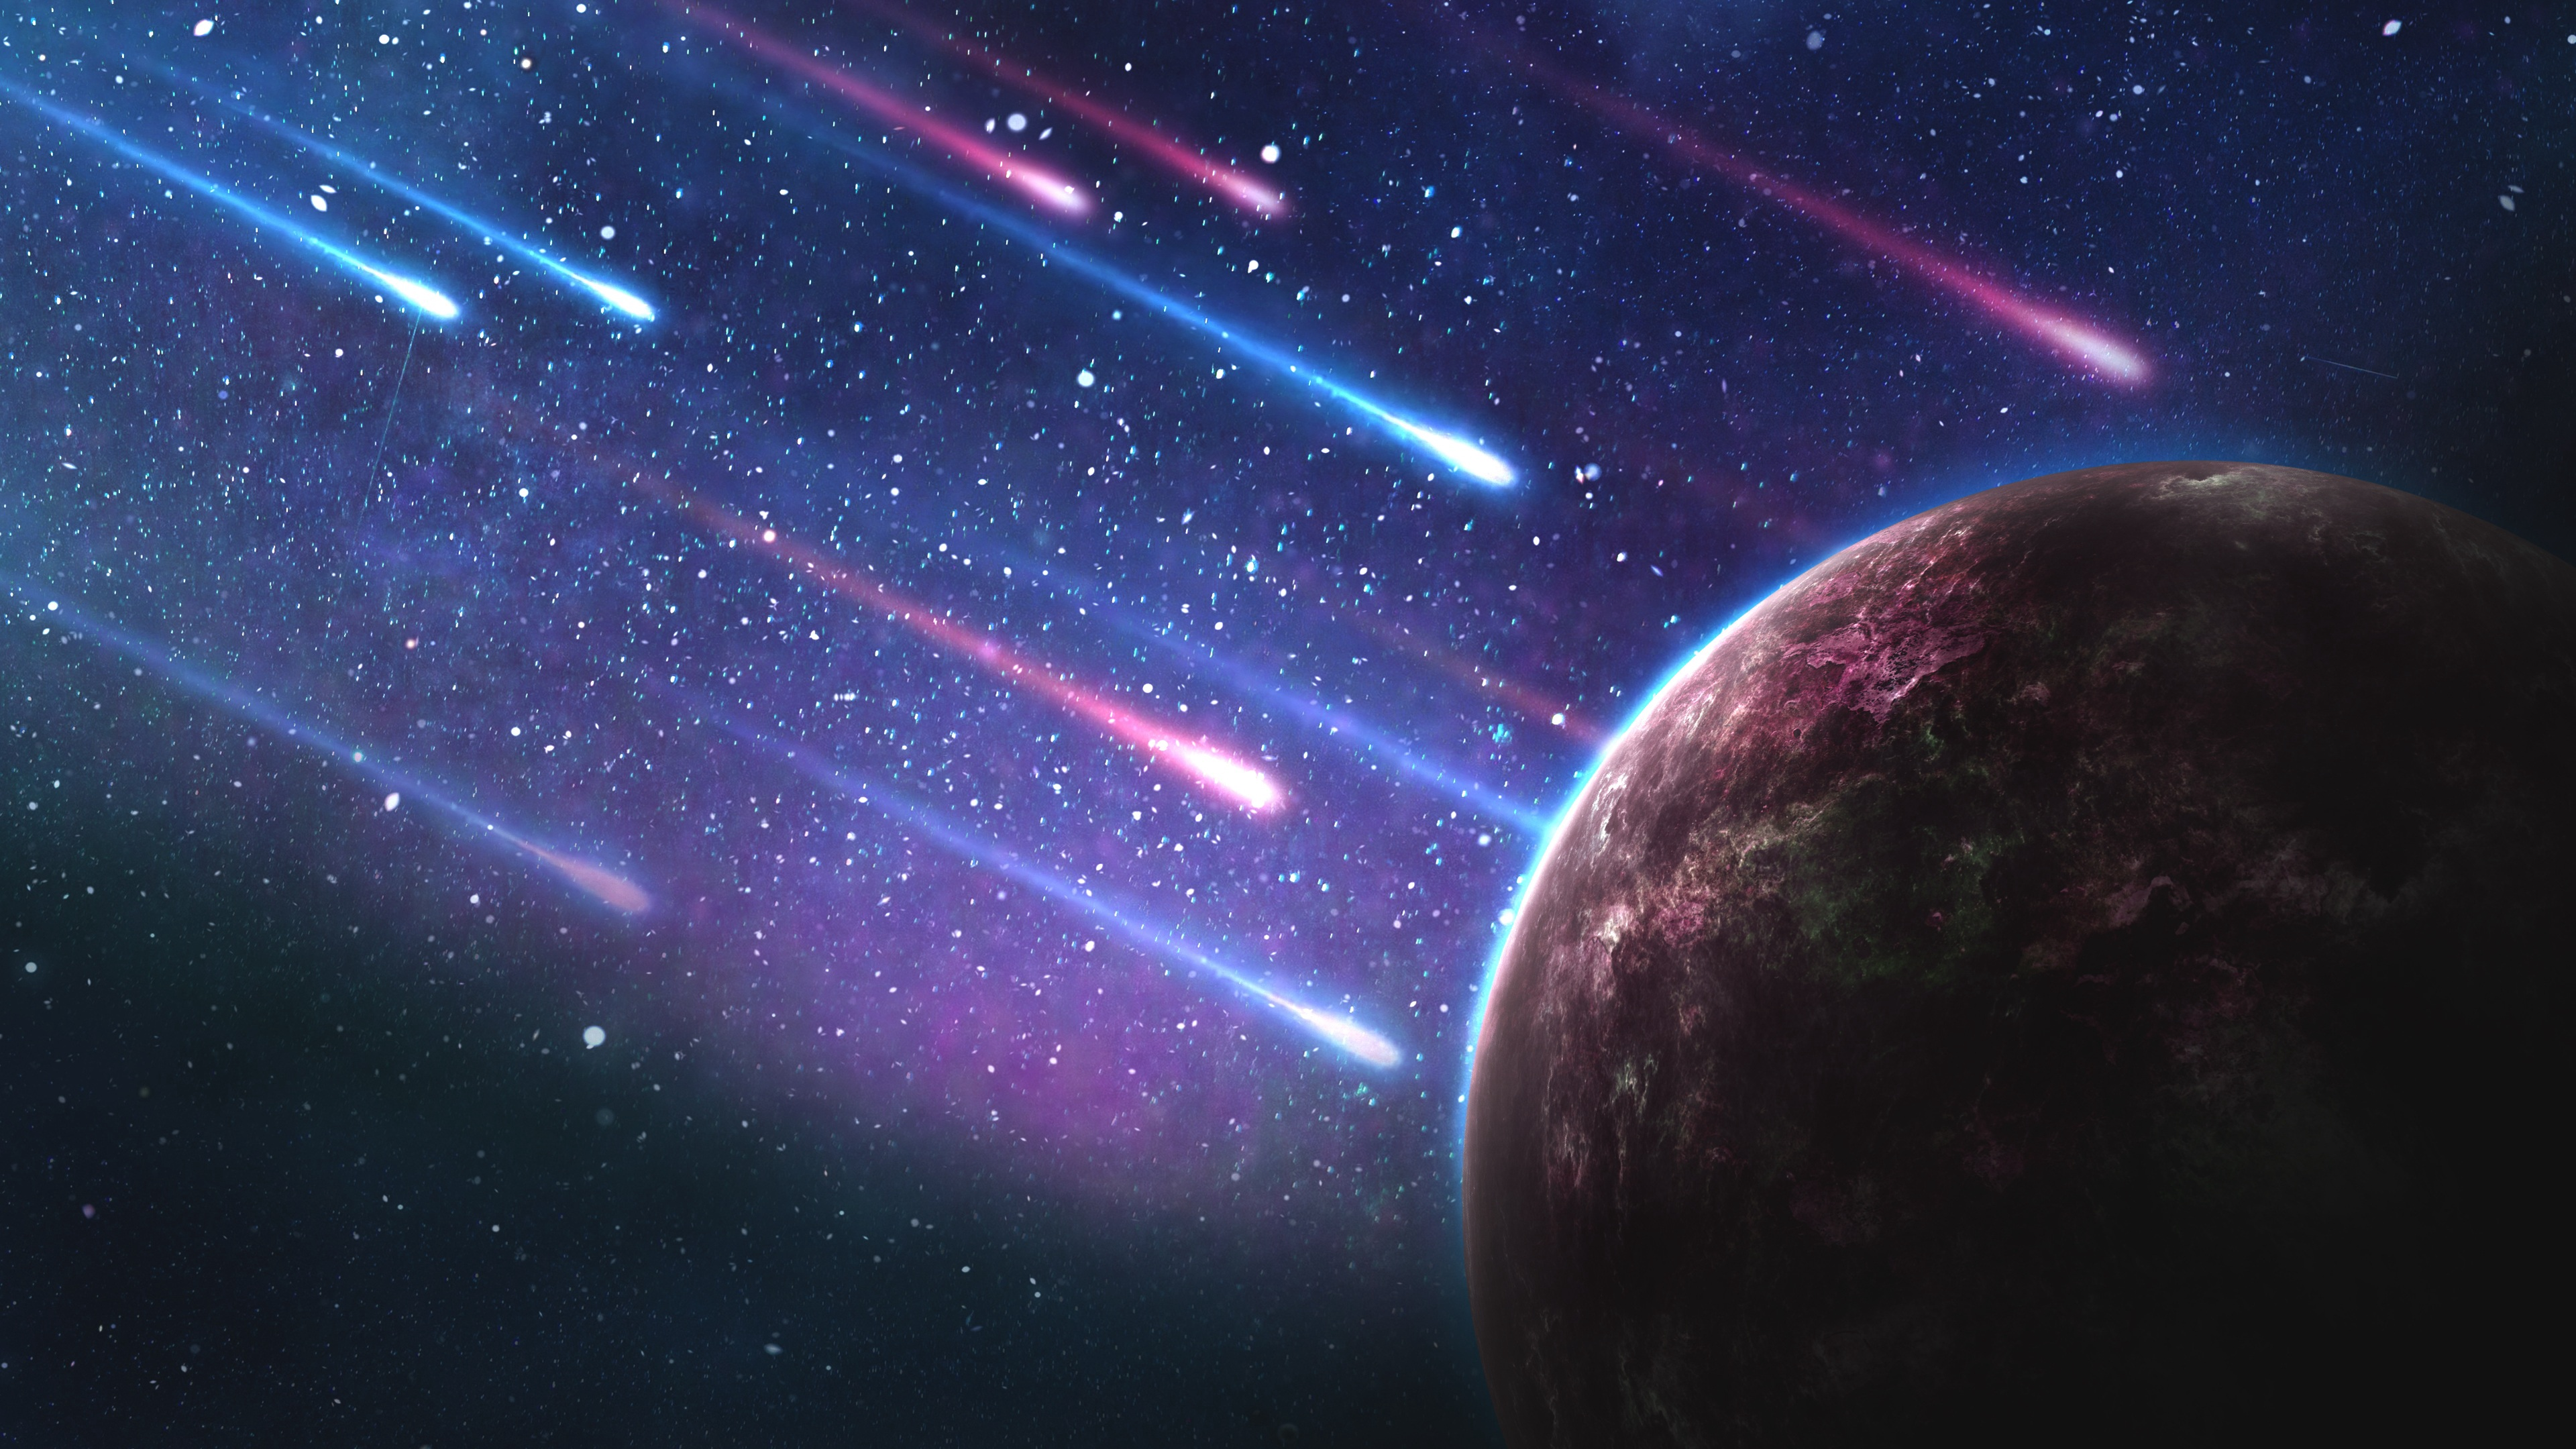 planet meteorites space galaxy 4k 1536016630 - planet, meteorites, space, galaxy 4k - Space, Planet, Meteorites